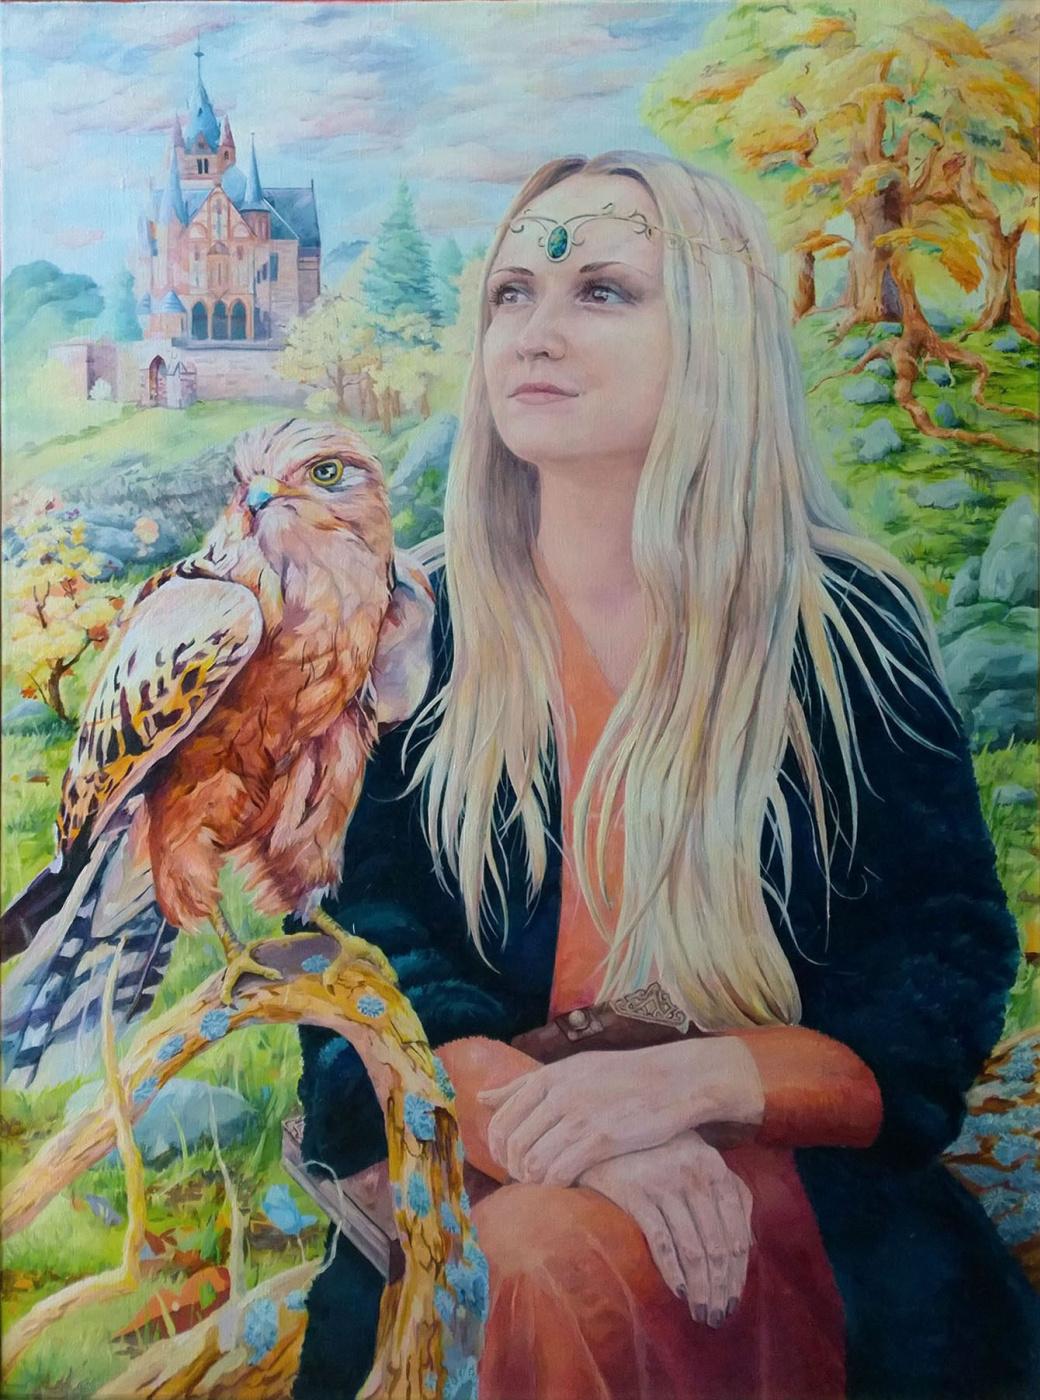 Сальфаир (Мария Мирошникова). Legends of the Forest Castle